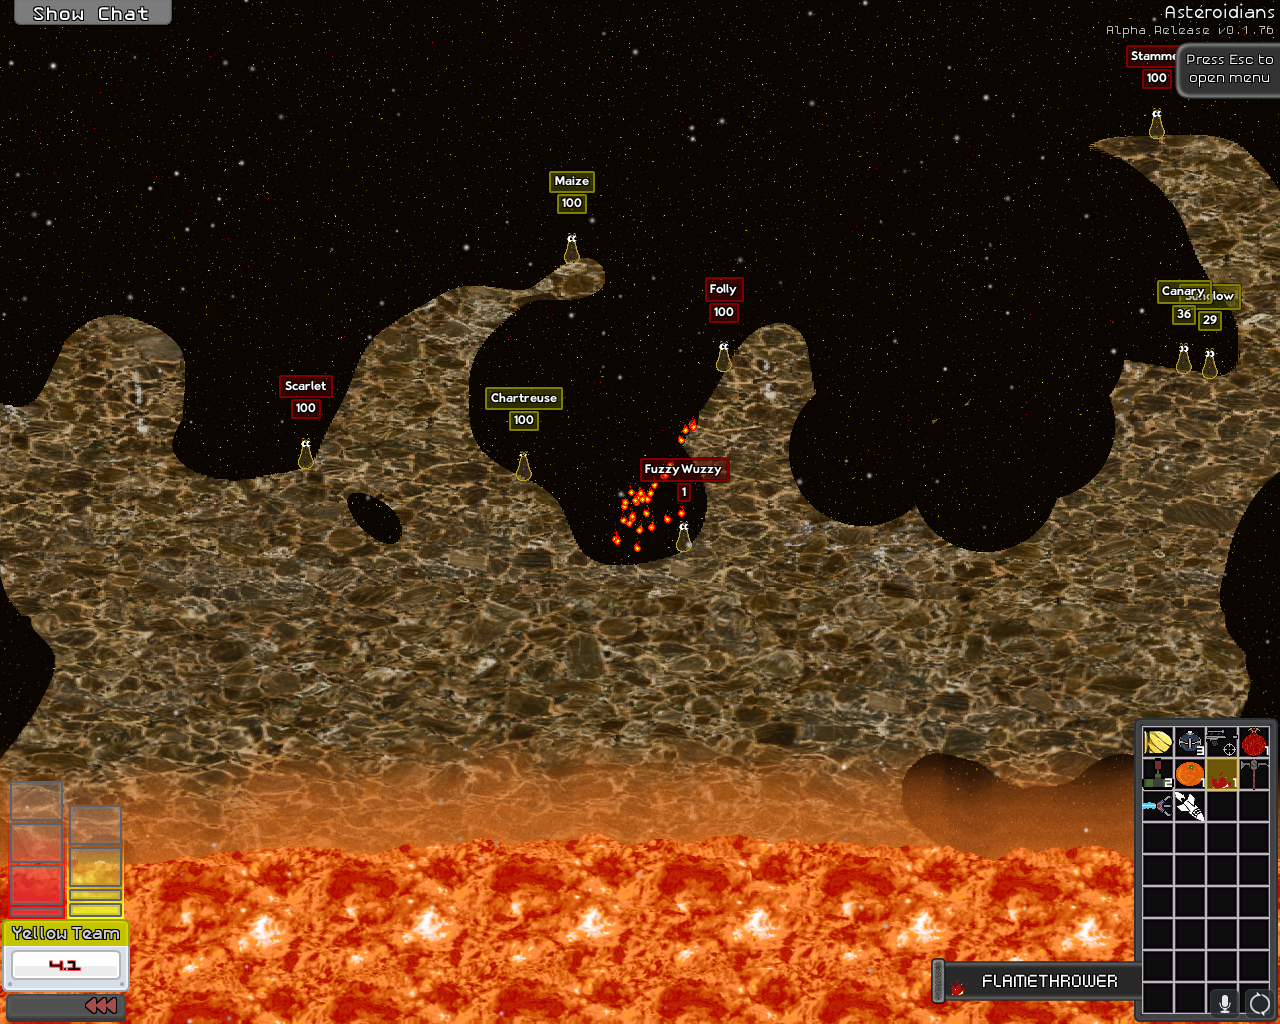 Asteroidians